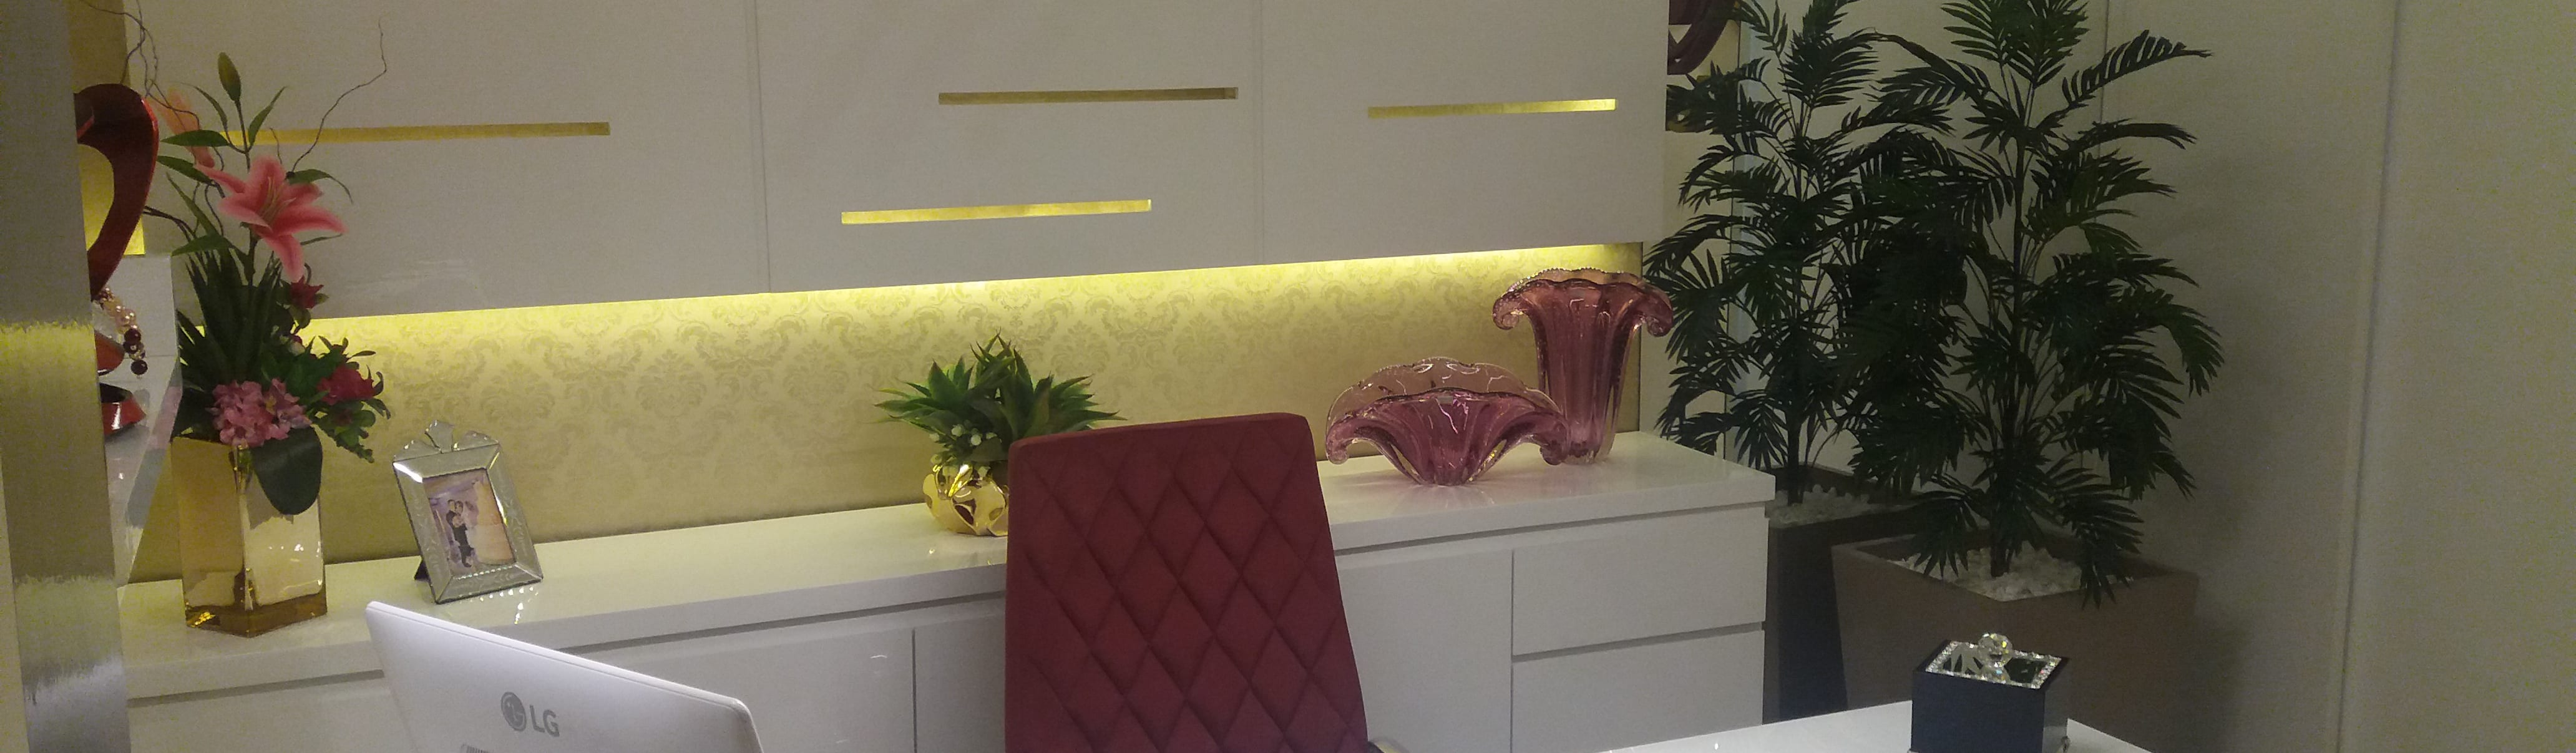 Duecad – Arquitetura e Interiores